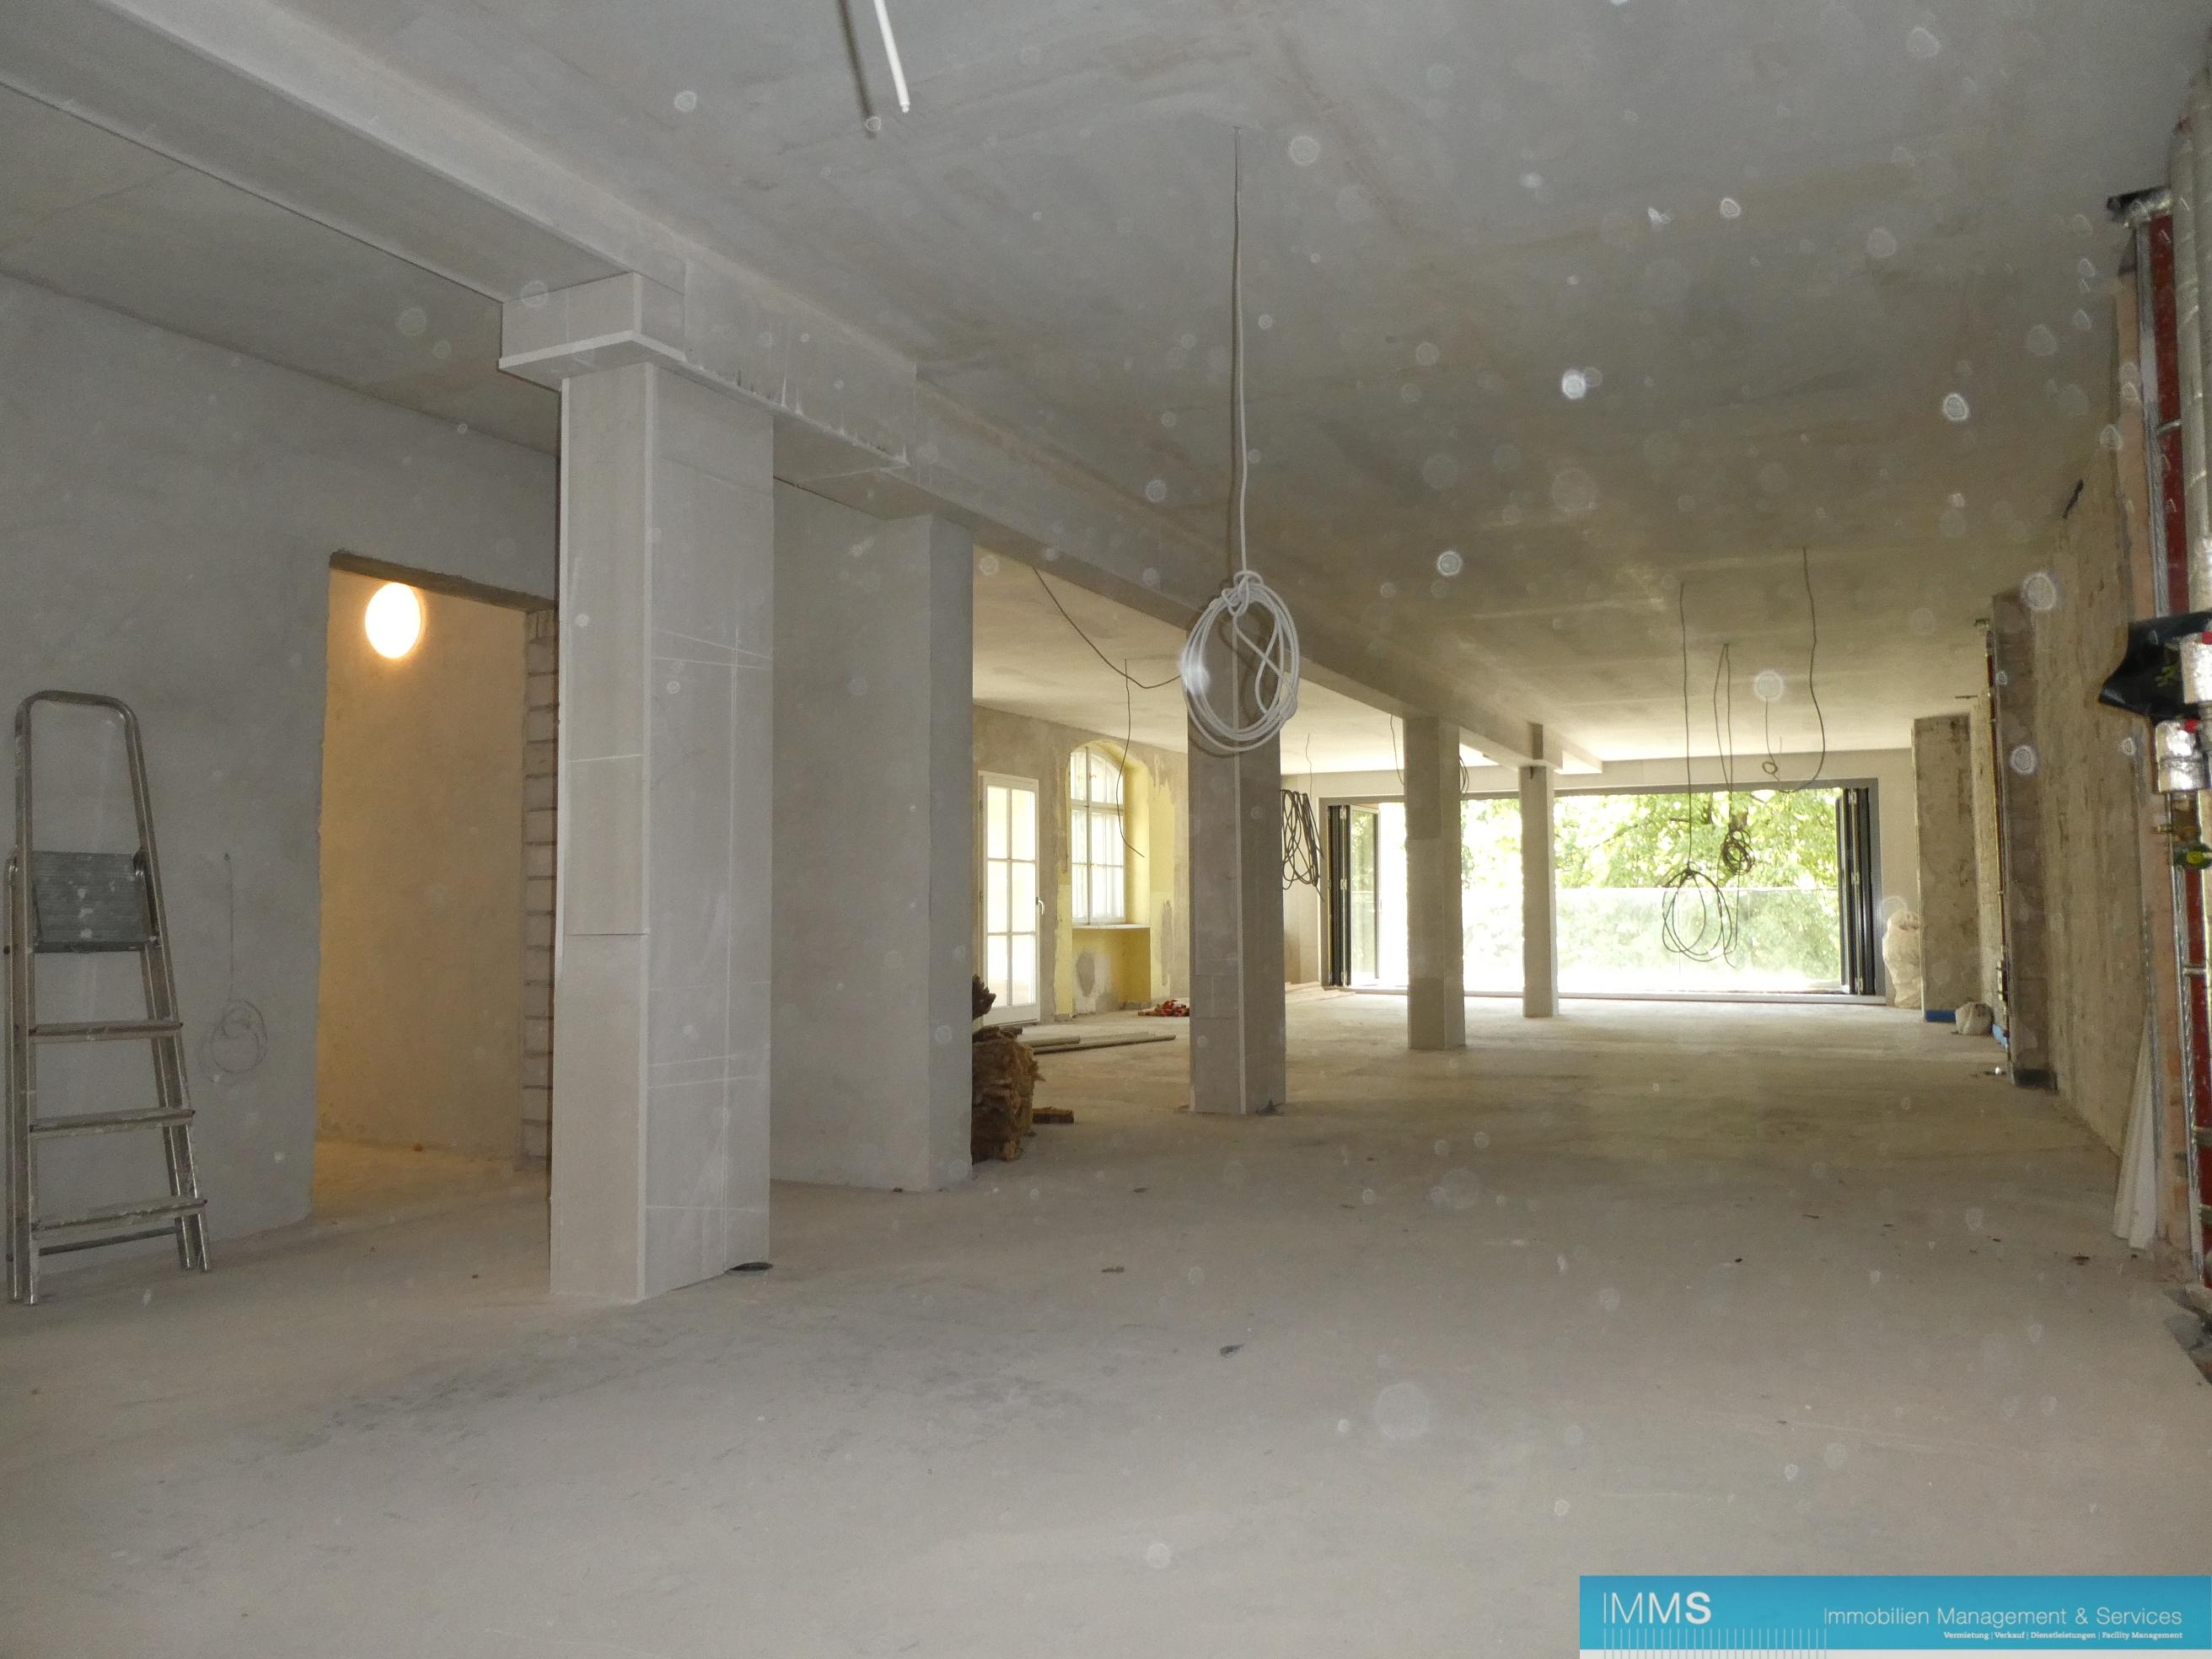 berlin mitte fabrik loft f r b ro praxis oder agentur ca 123 m imms. Black Bedroom Furniture Sets. Home Design Ideas